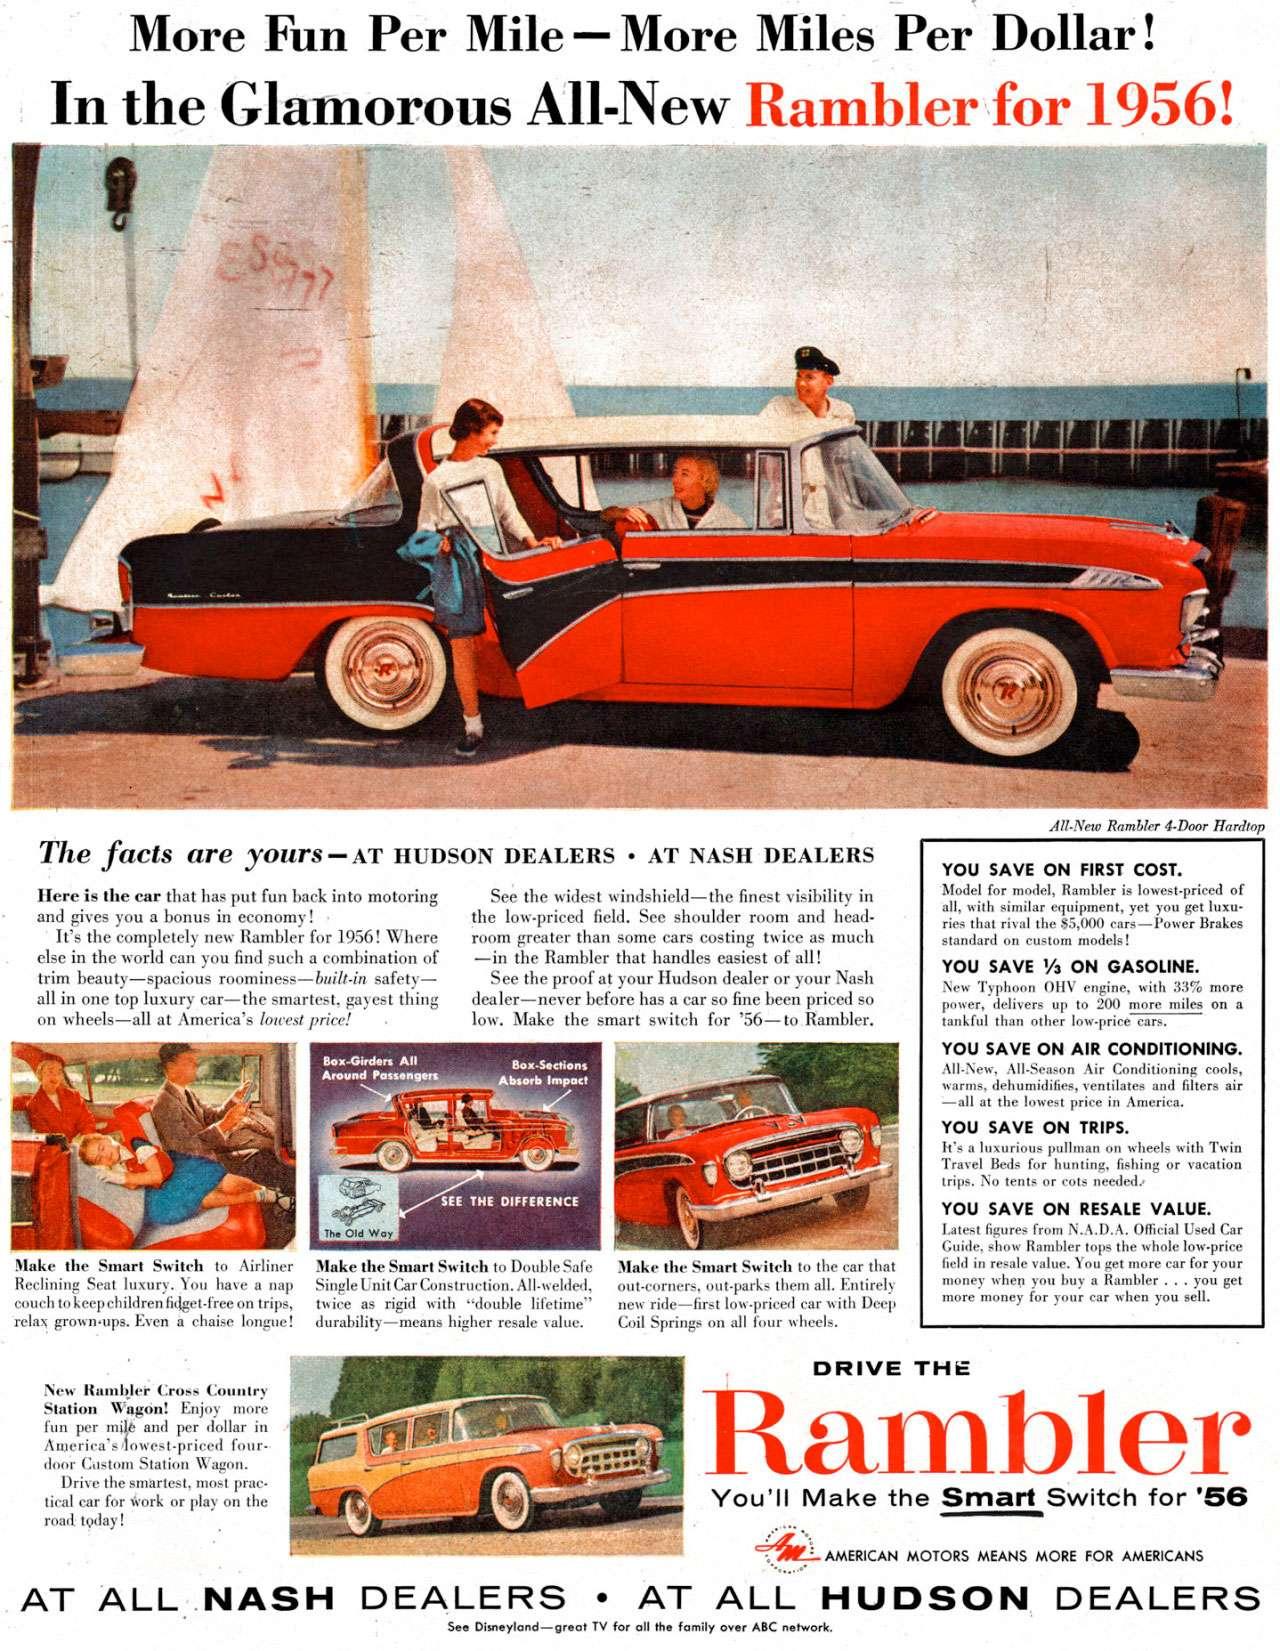 julio cezar kronbauer 39 s blog american motors corporation amc. Black Bedroom Furniture Sets. Home Design Ideas